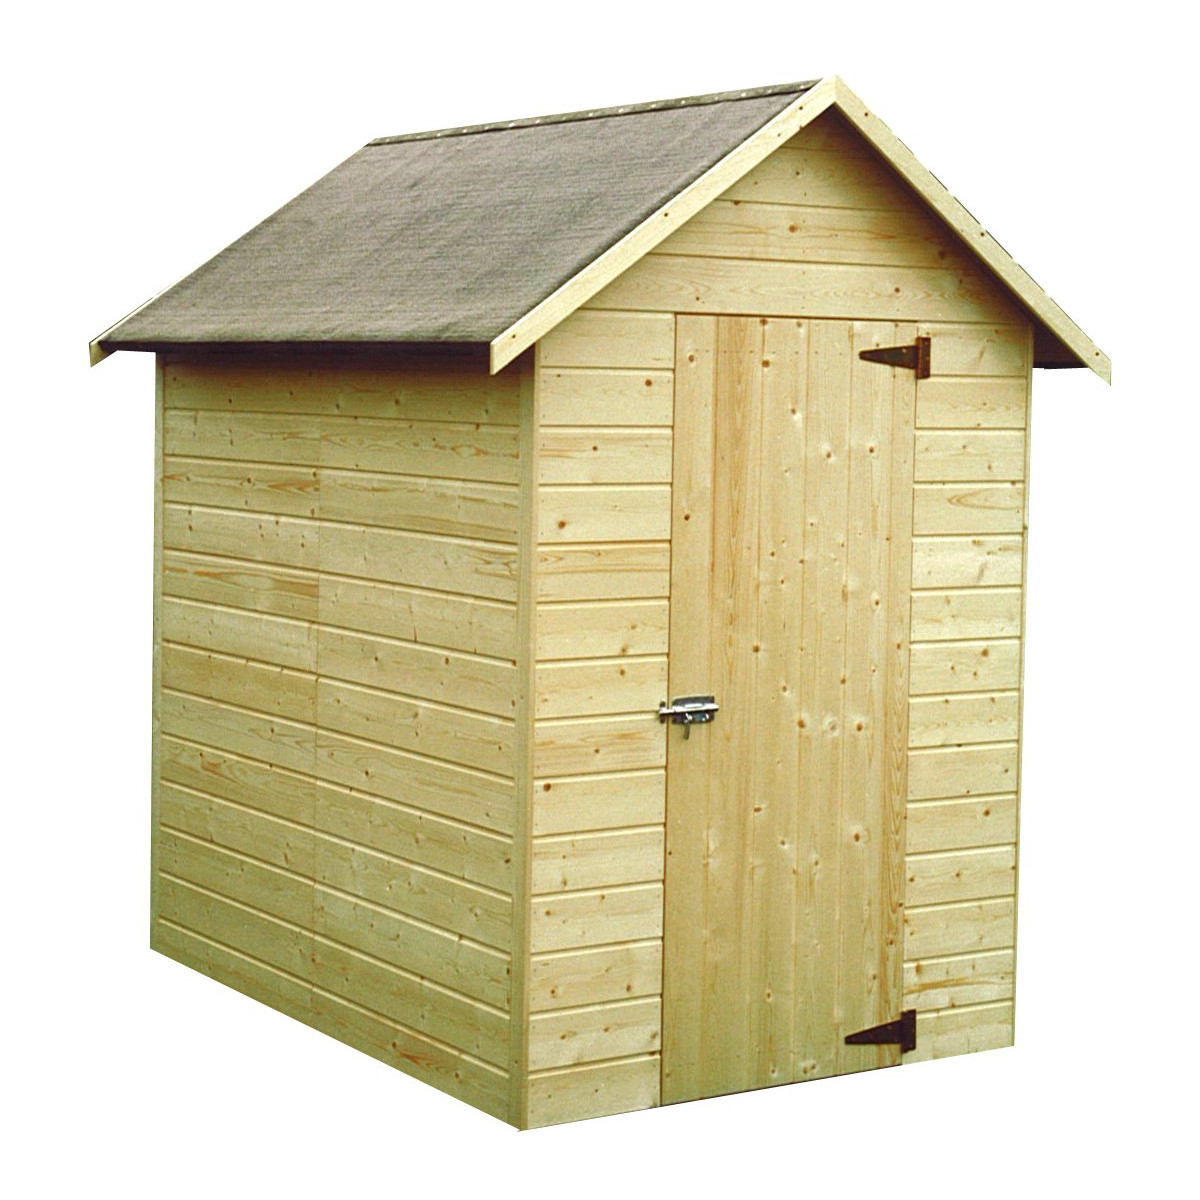 Abri de jardin bois pas cher cabane de jardin en bois pas - Bordure de jardin en pierre pas cher ...